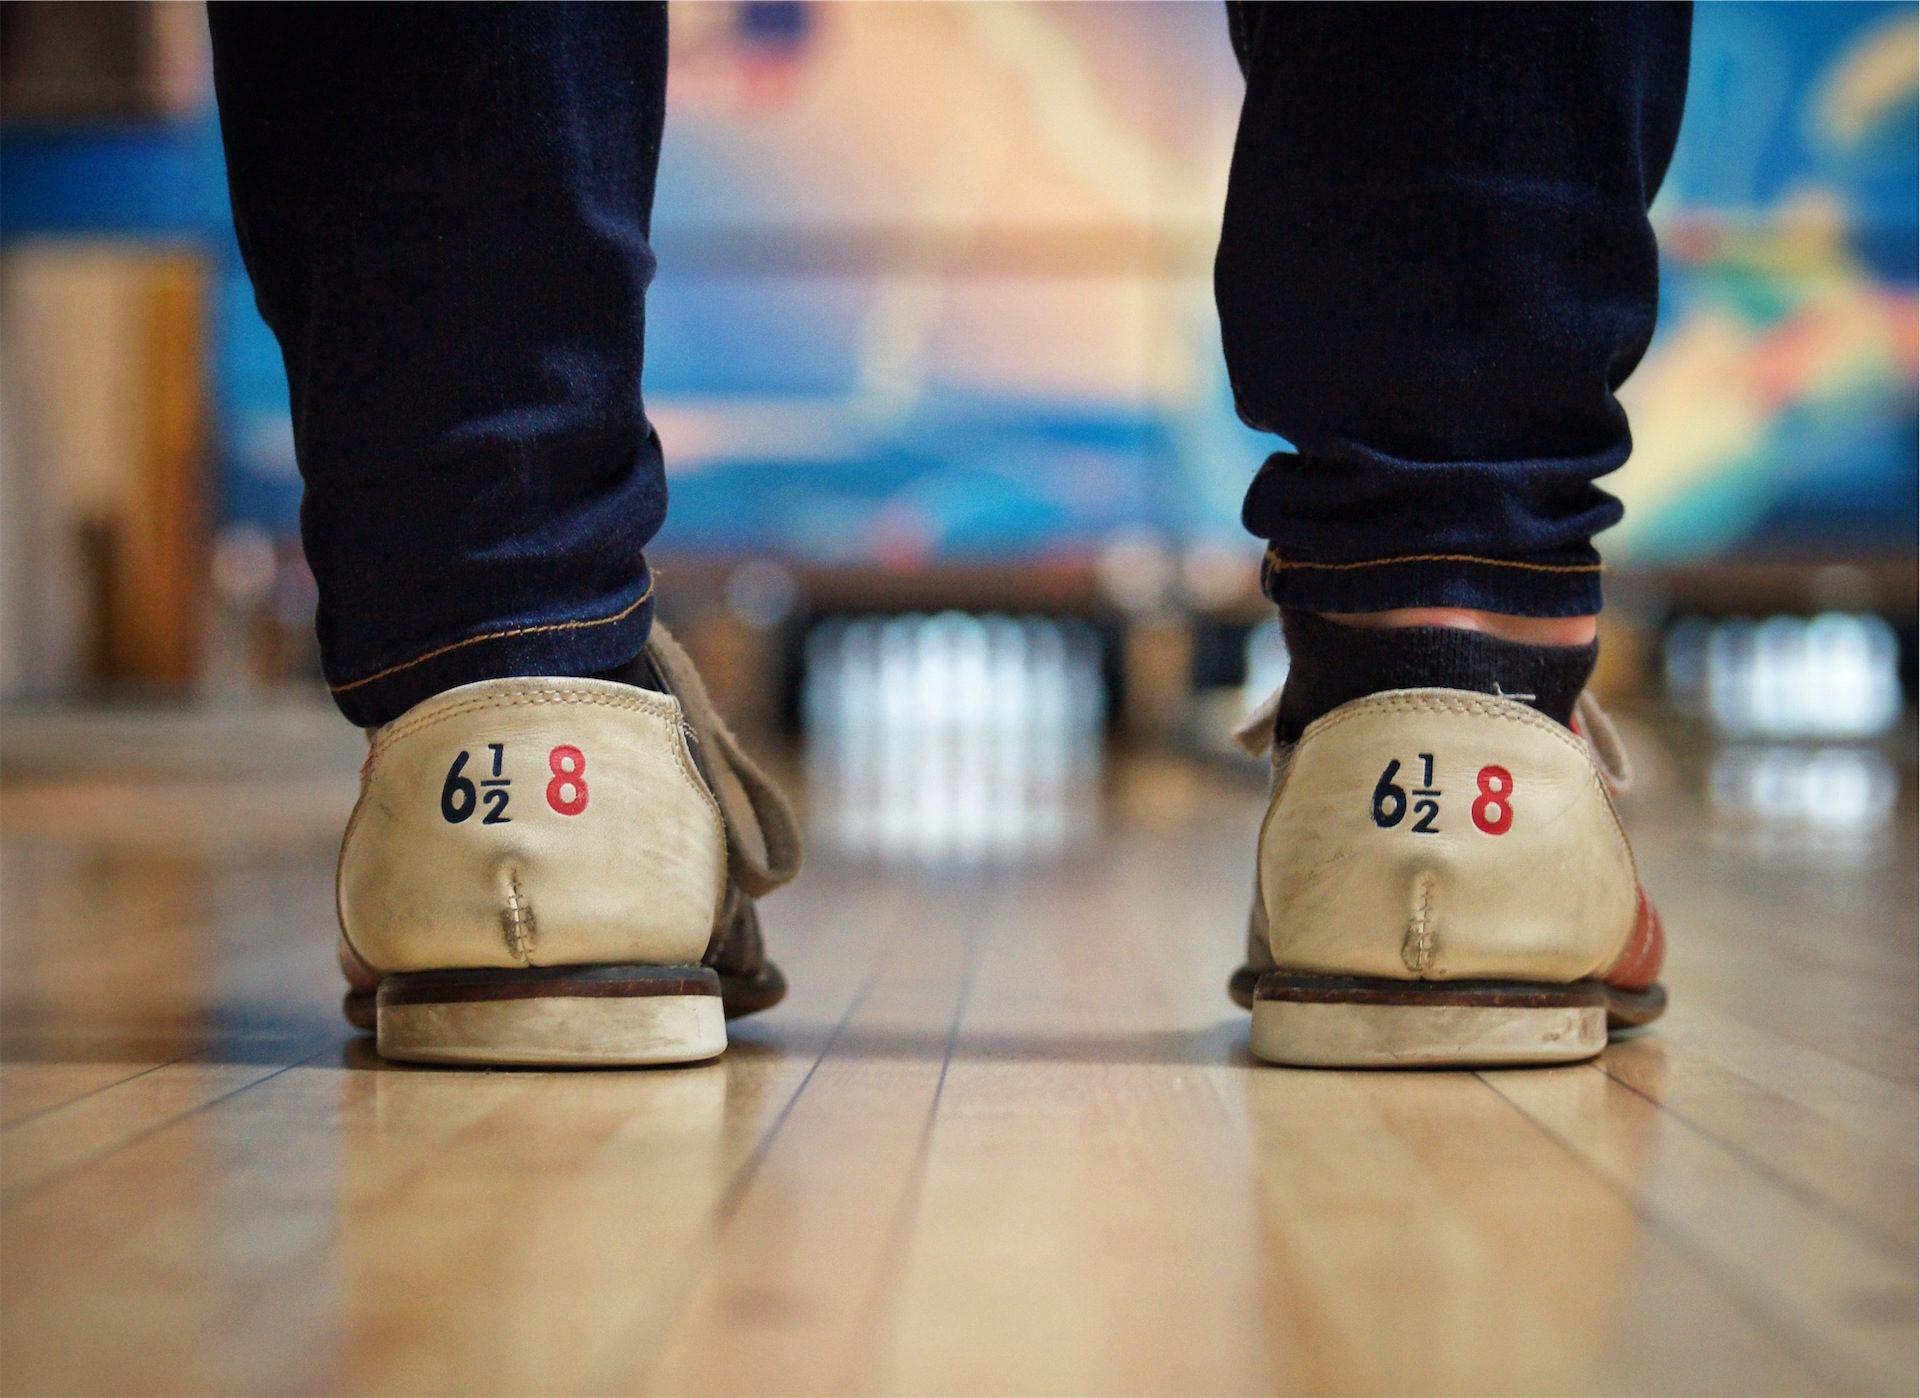 scarpe, pista da bowling, Bowling, gioco, gambe - Sfondi HD - Professor-falken.com